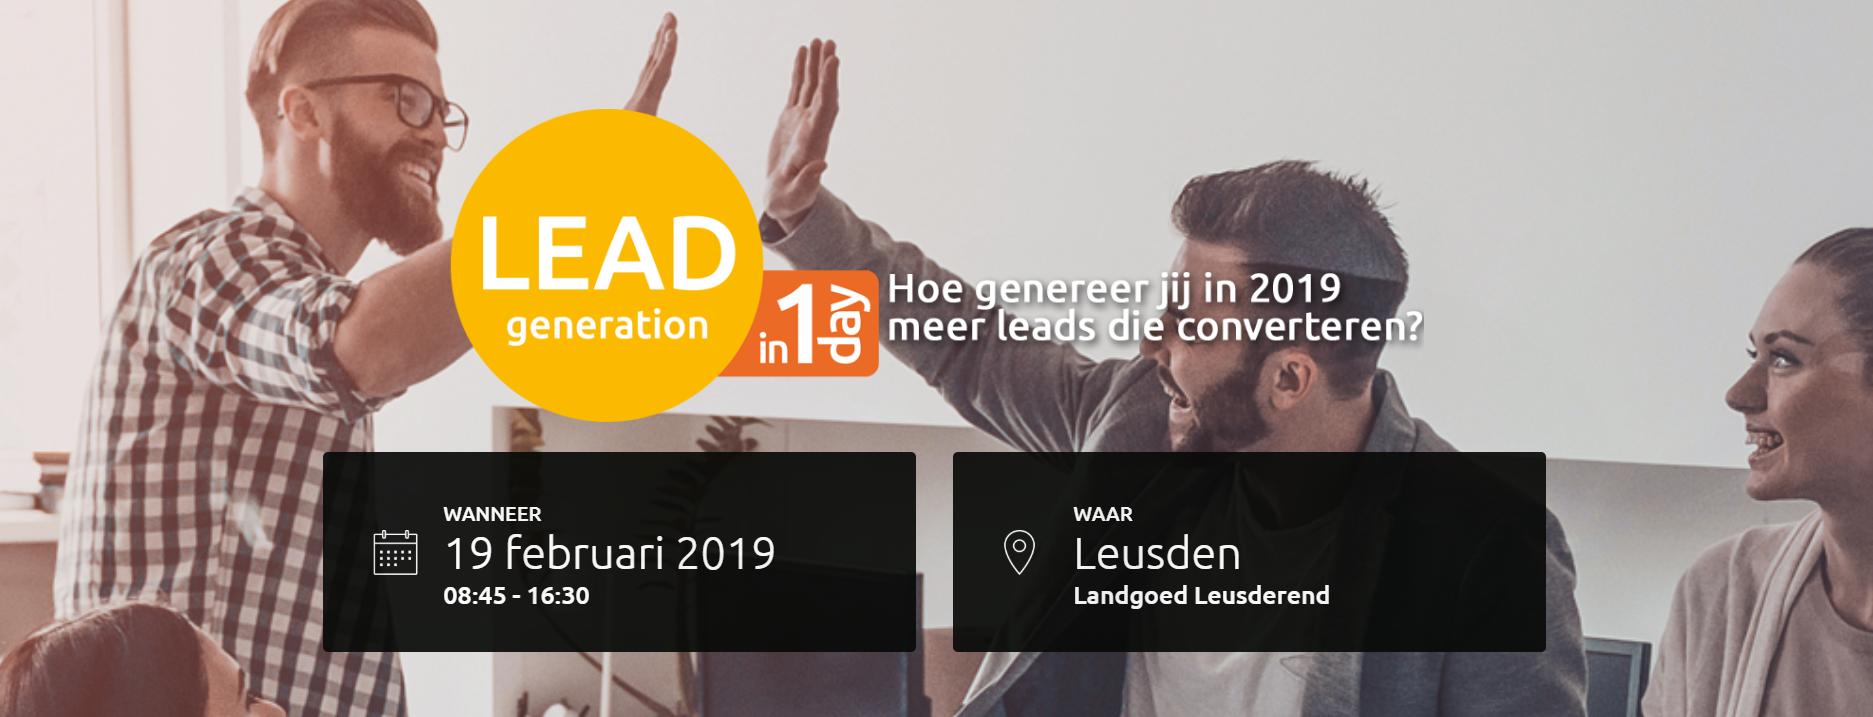 b2b leadgeneratie banner 2019